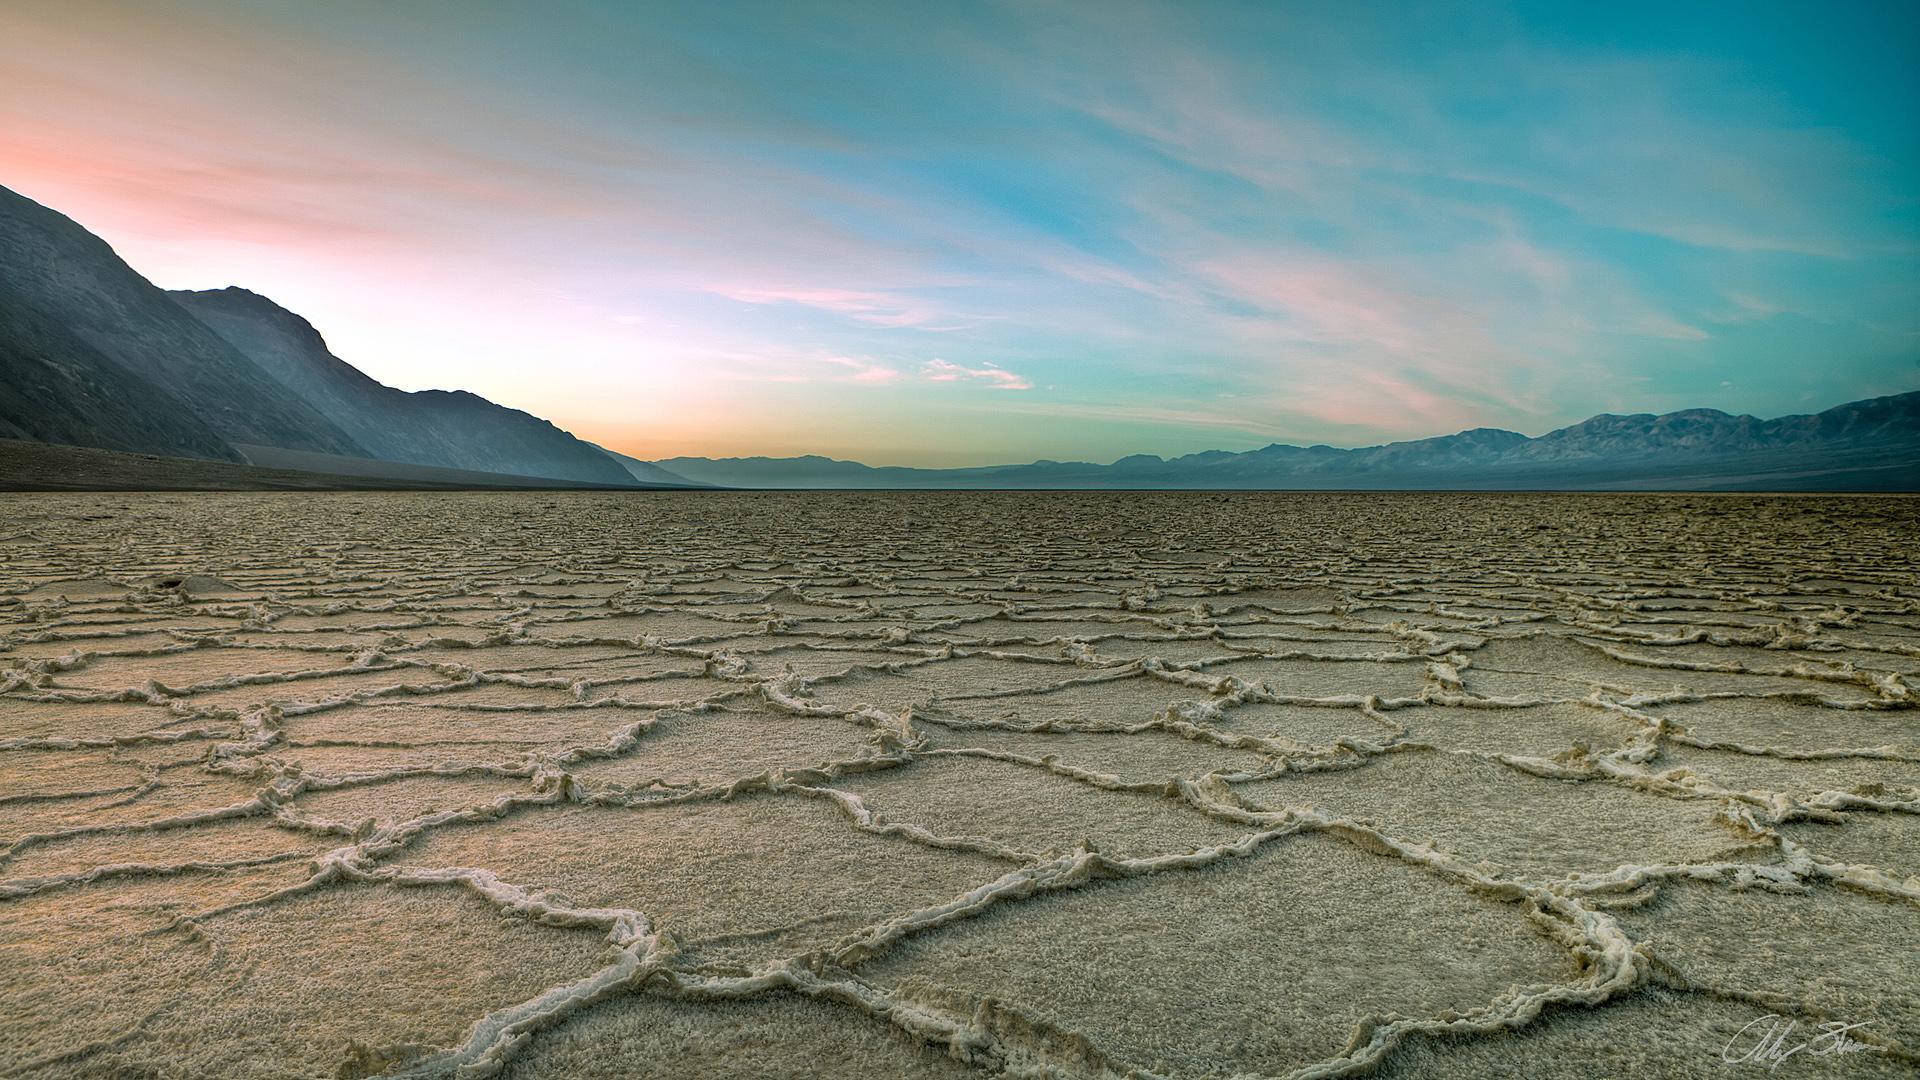 desert hd wallpaper background image 1920x1080 id 87546